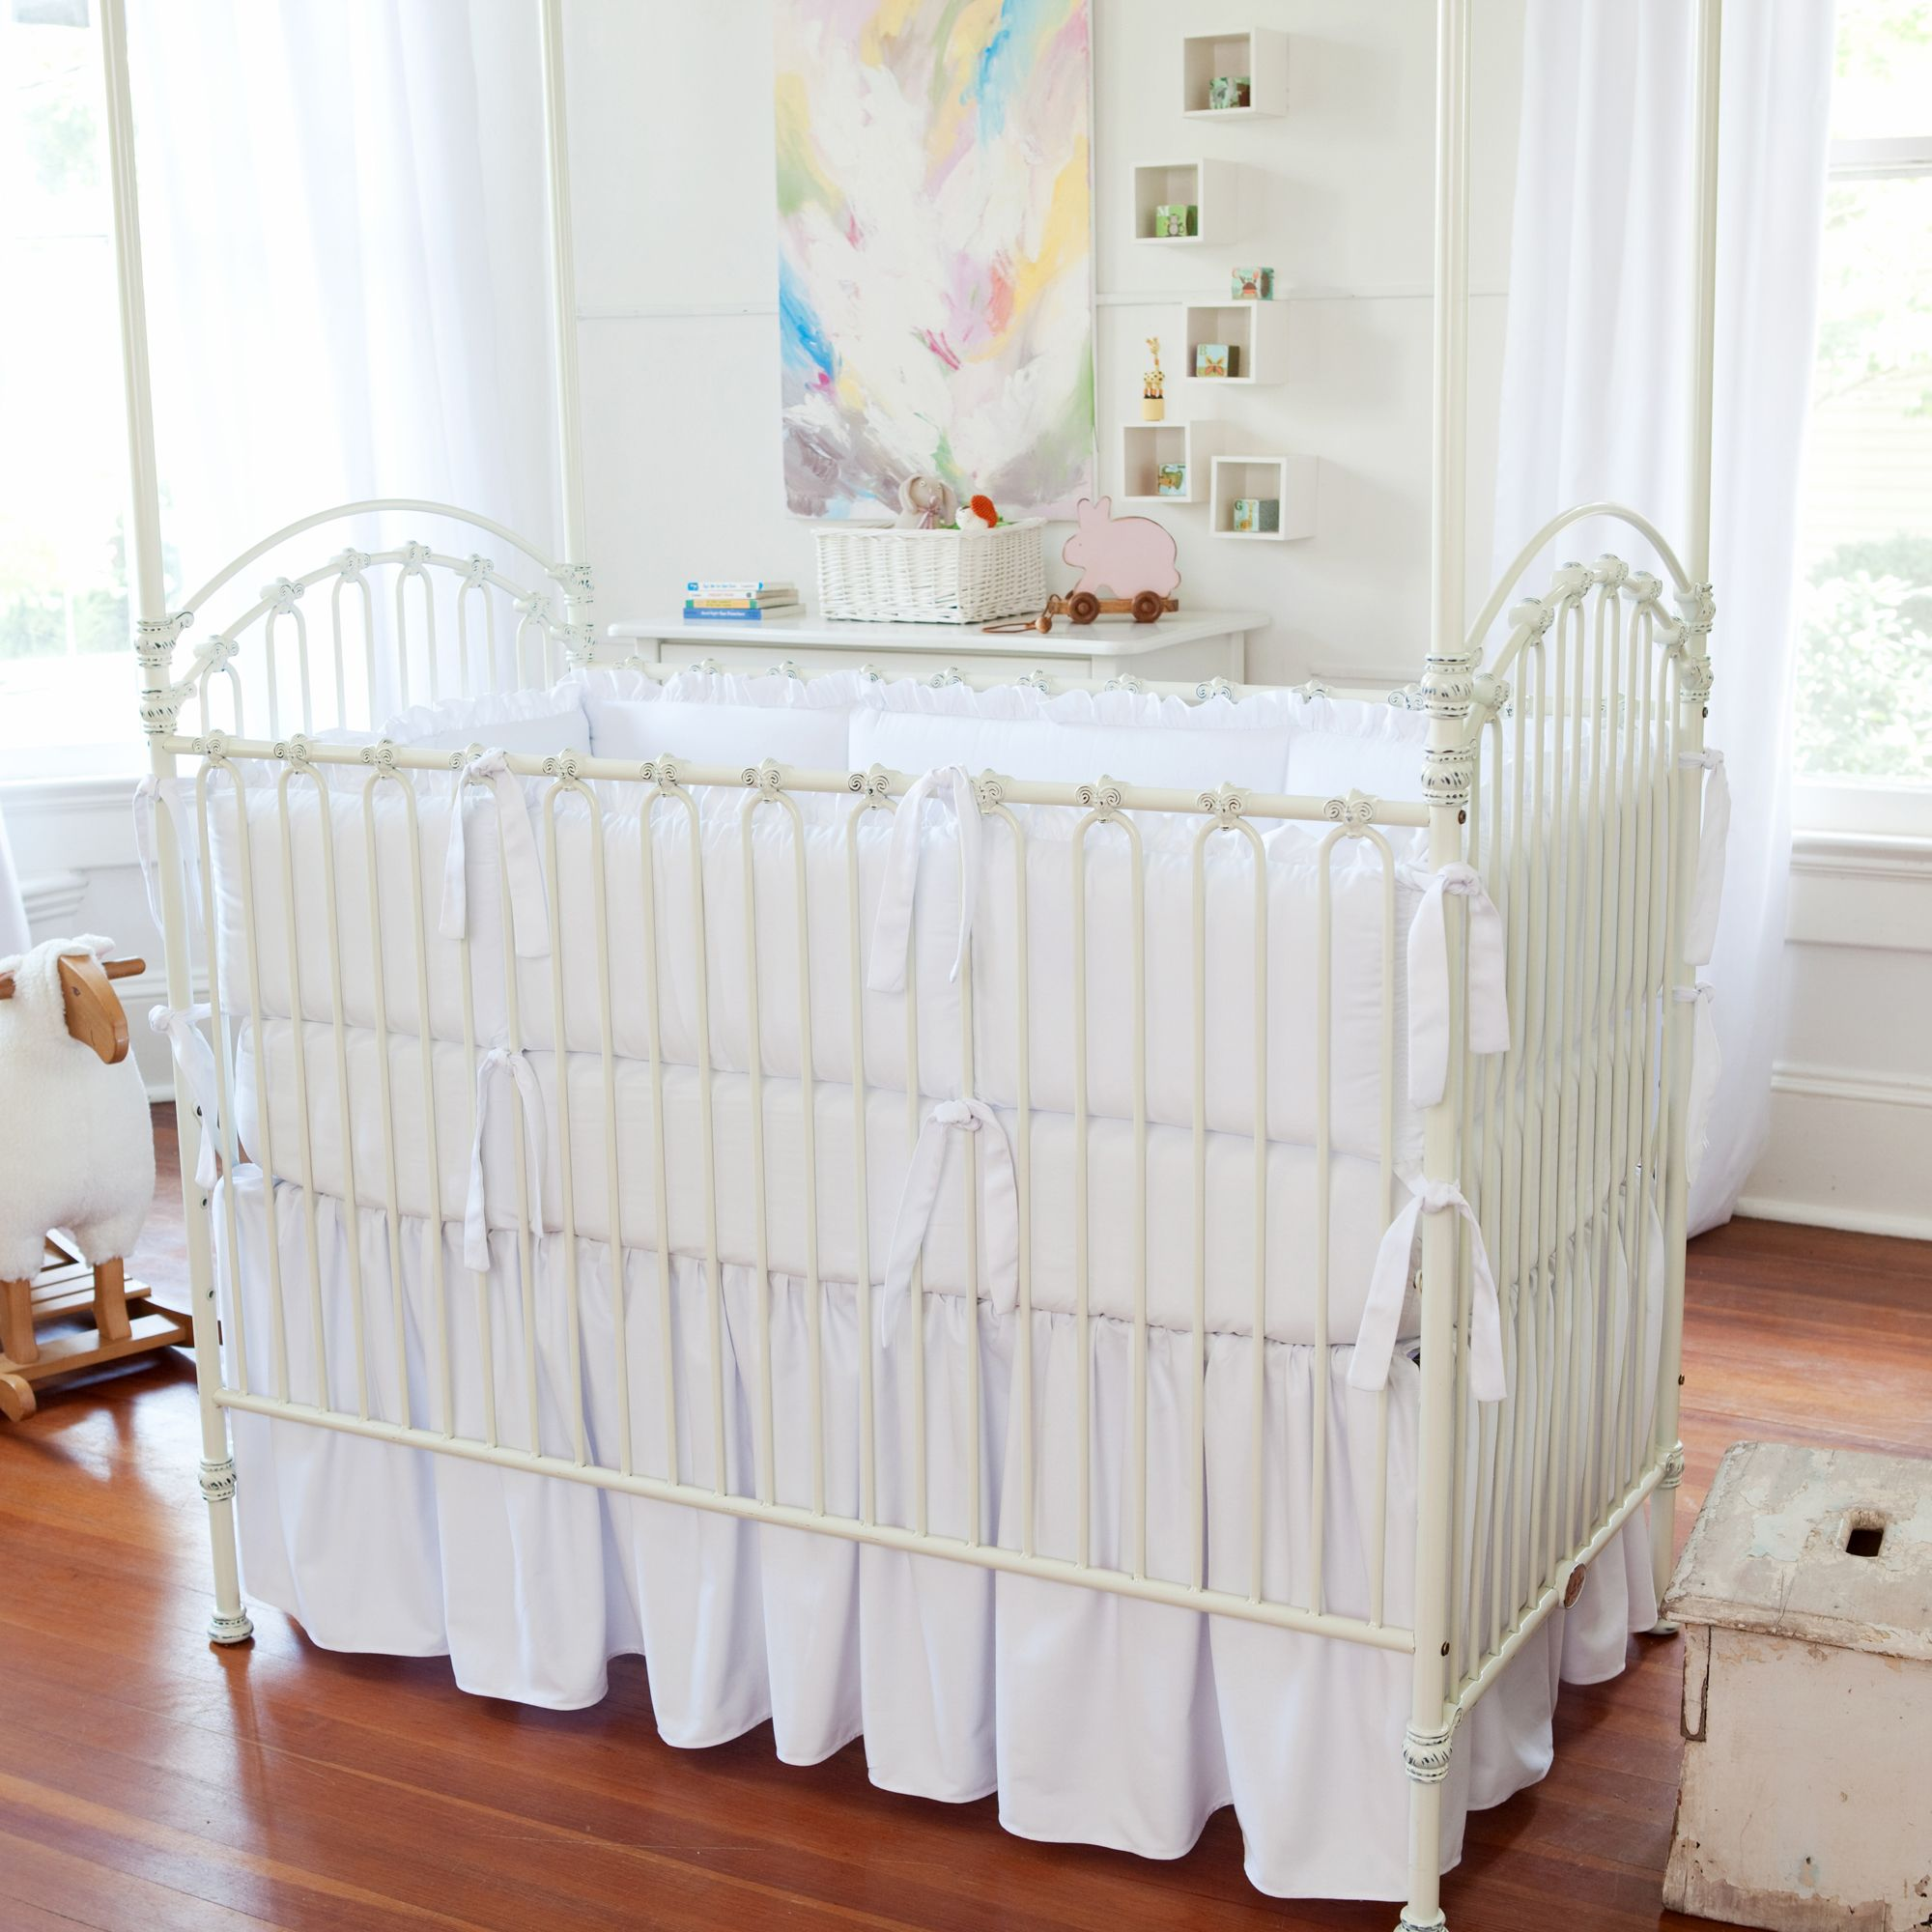 Search Results Crib sets for boys, Crib bedding boy, Cribs